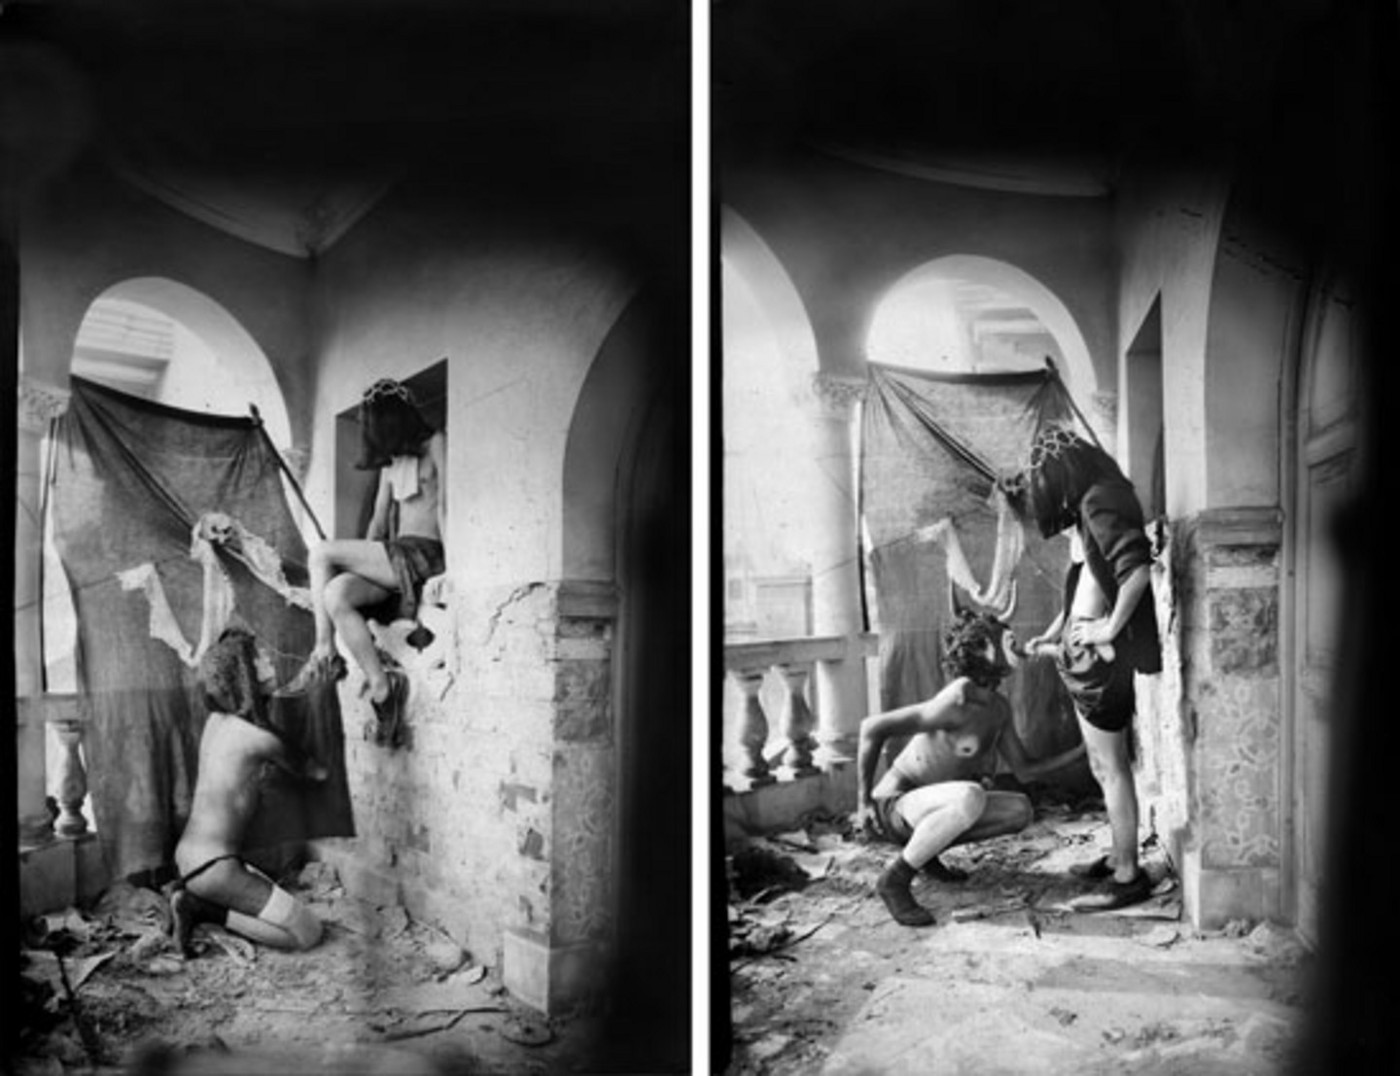 Серджио Зеваллос (Grupo Chaclacayo), Ambulantes, из серии Suburbios, 1984.Предоставлено Серджио Зеваллосом